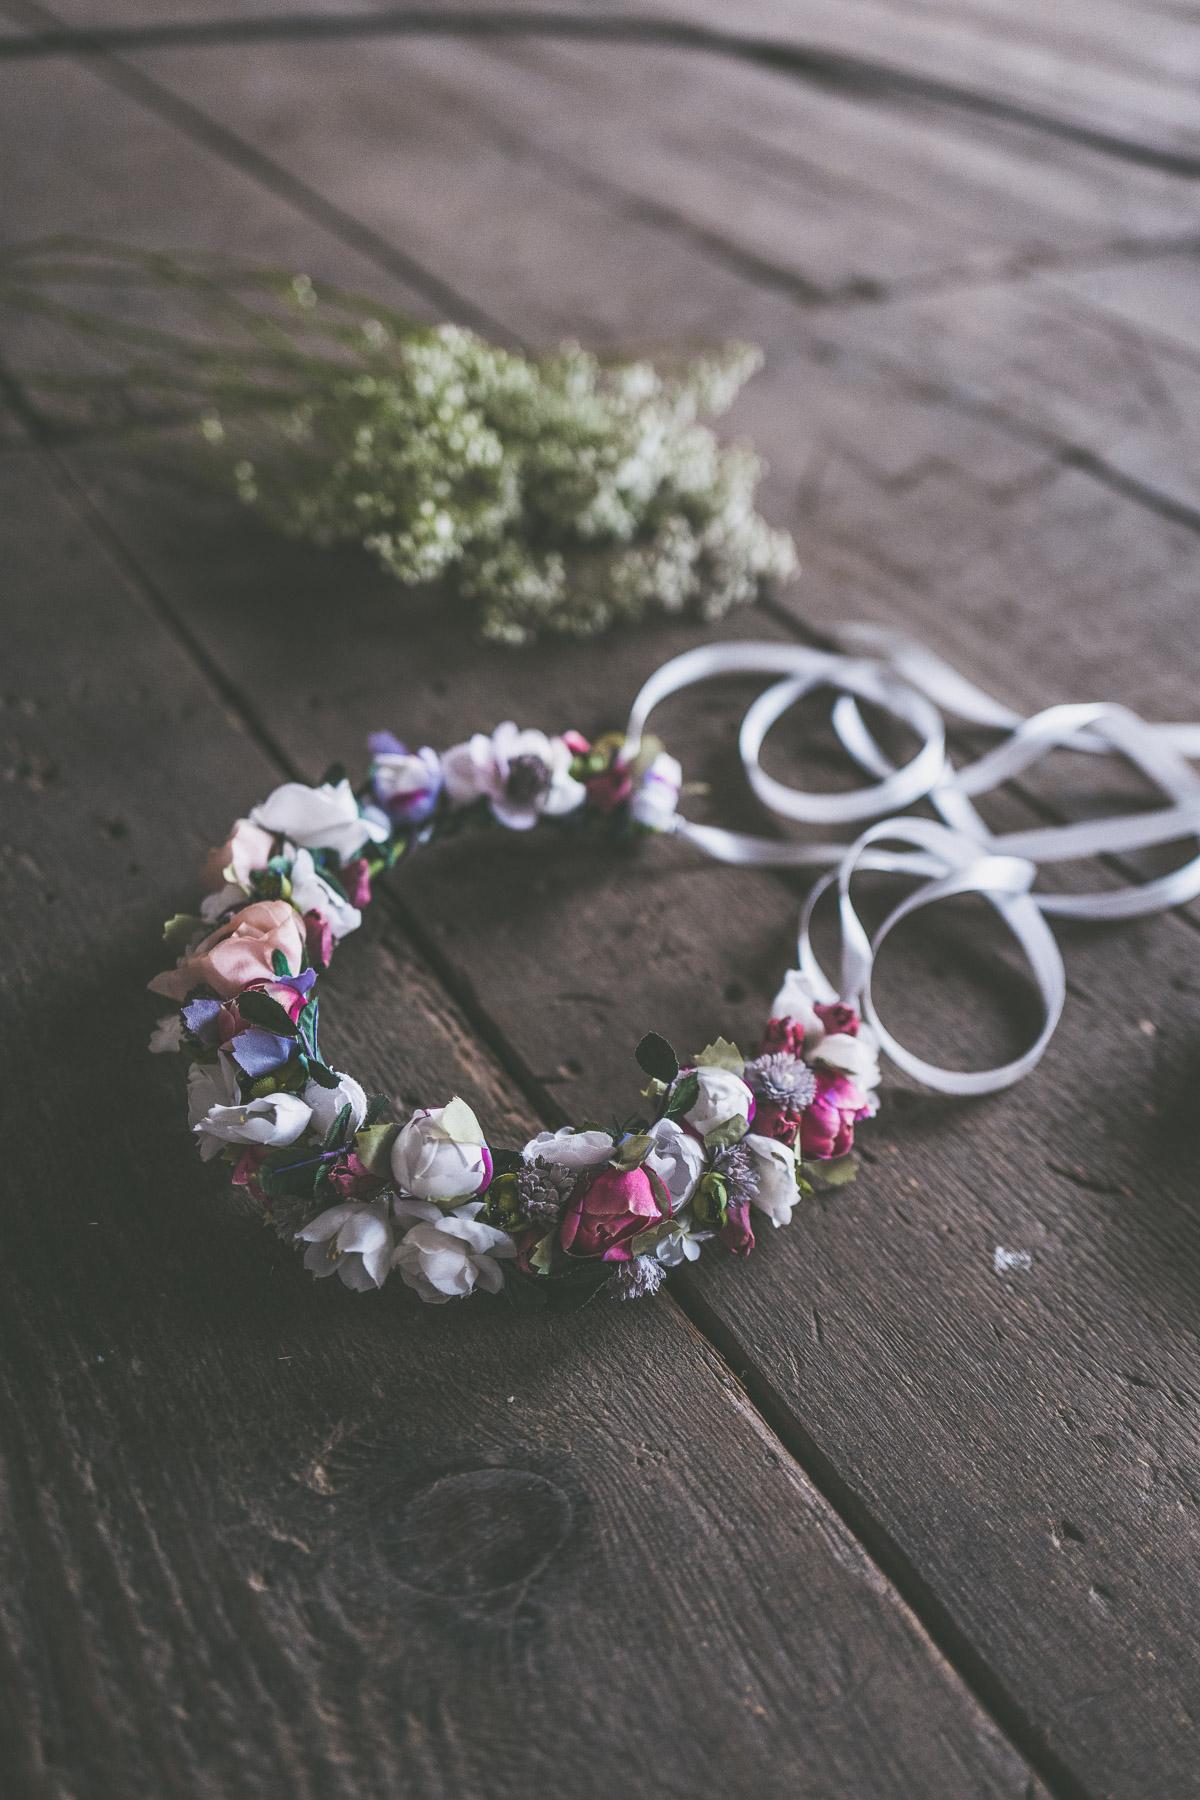 We-Are-Flowergirls_SS17_Couture-Collection_Blumenkranz_Flowercrown_007_1160637.jpg